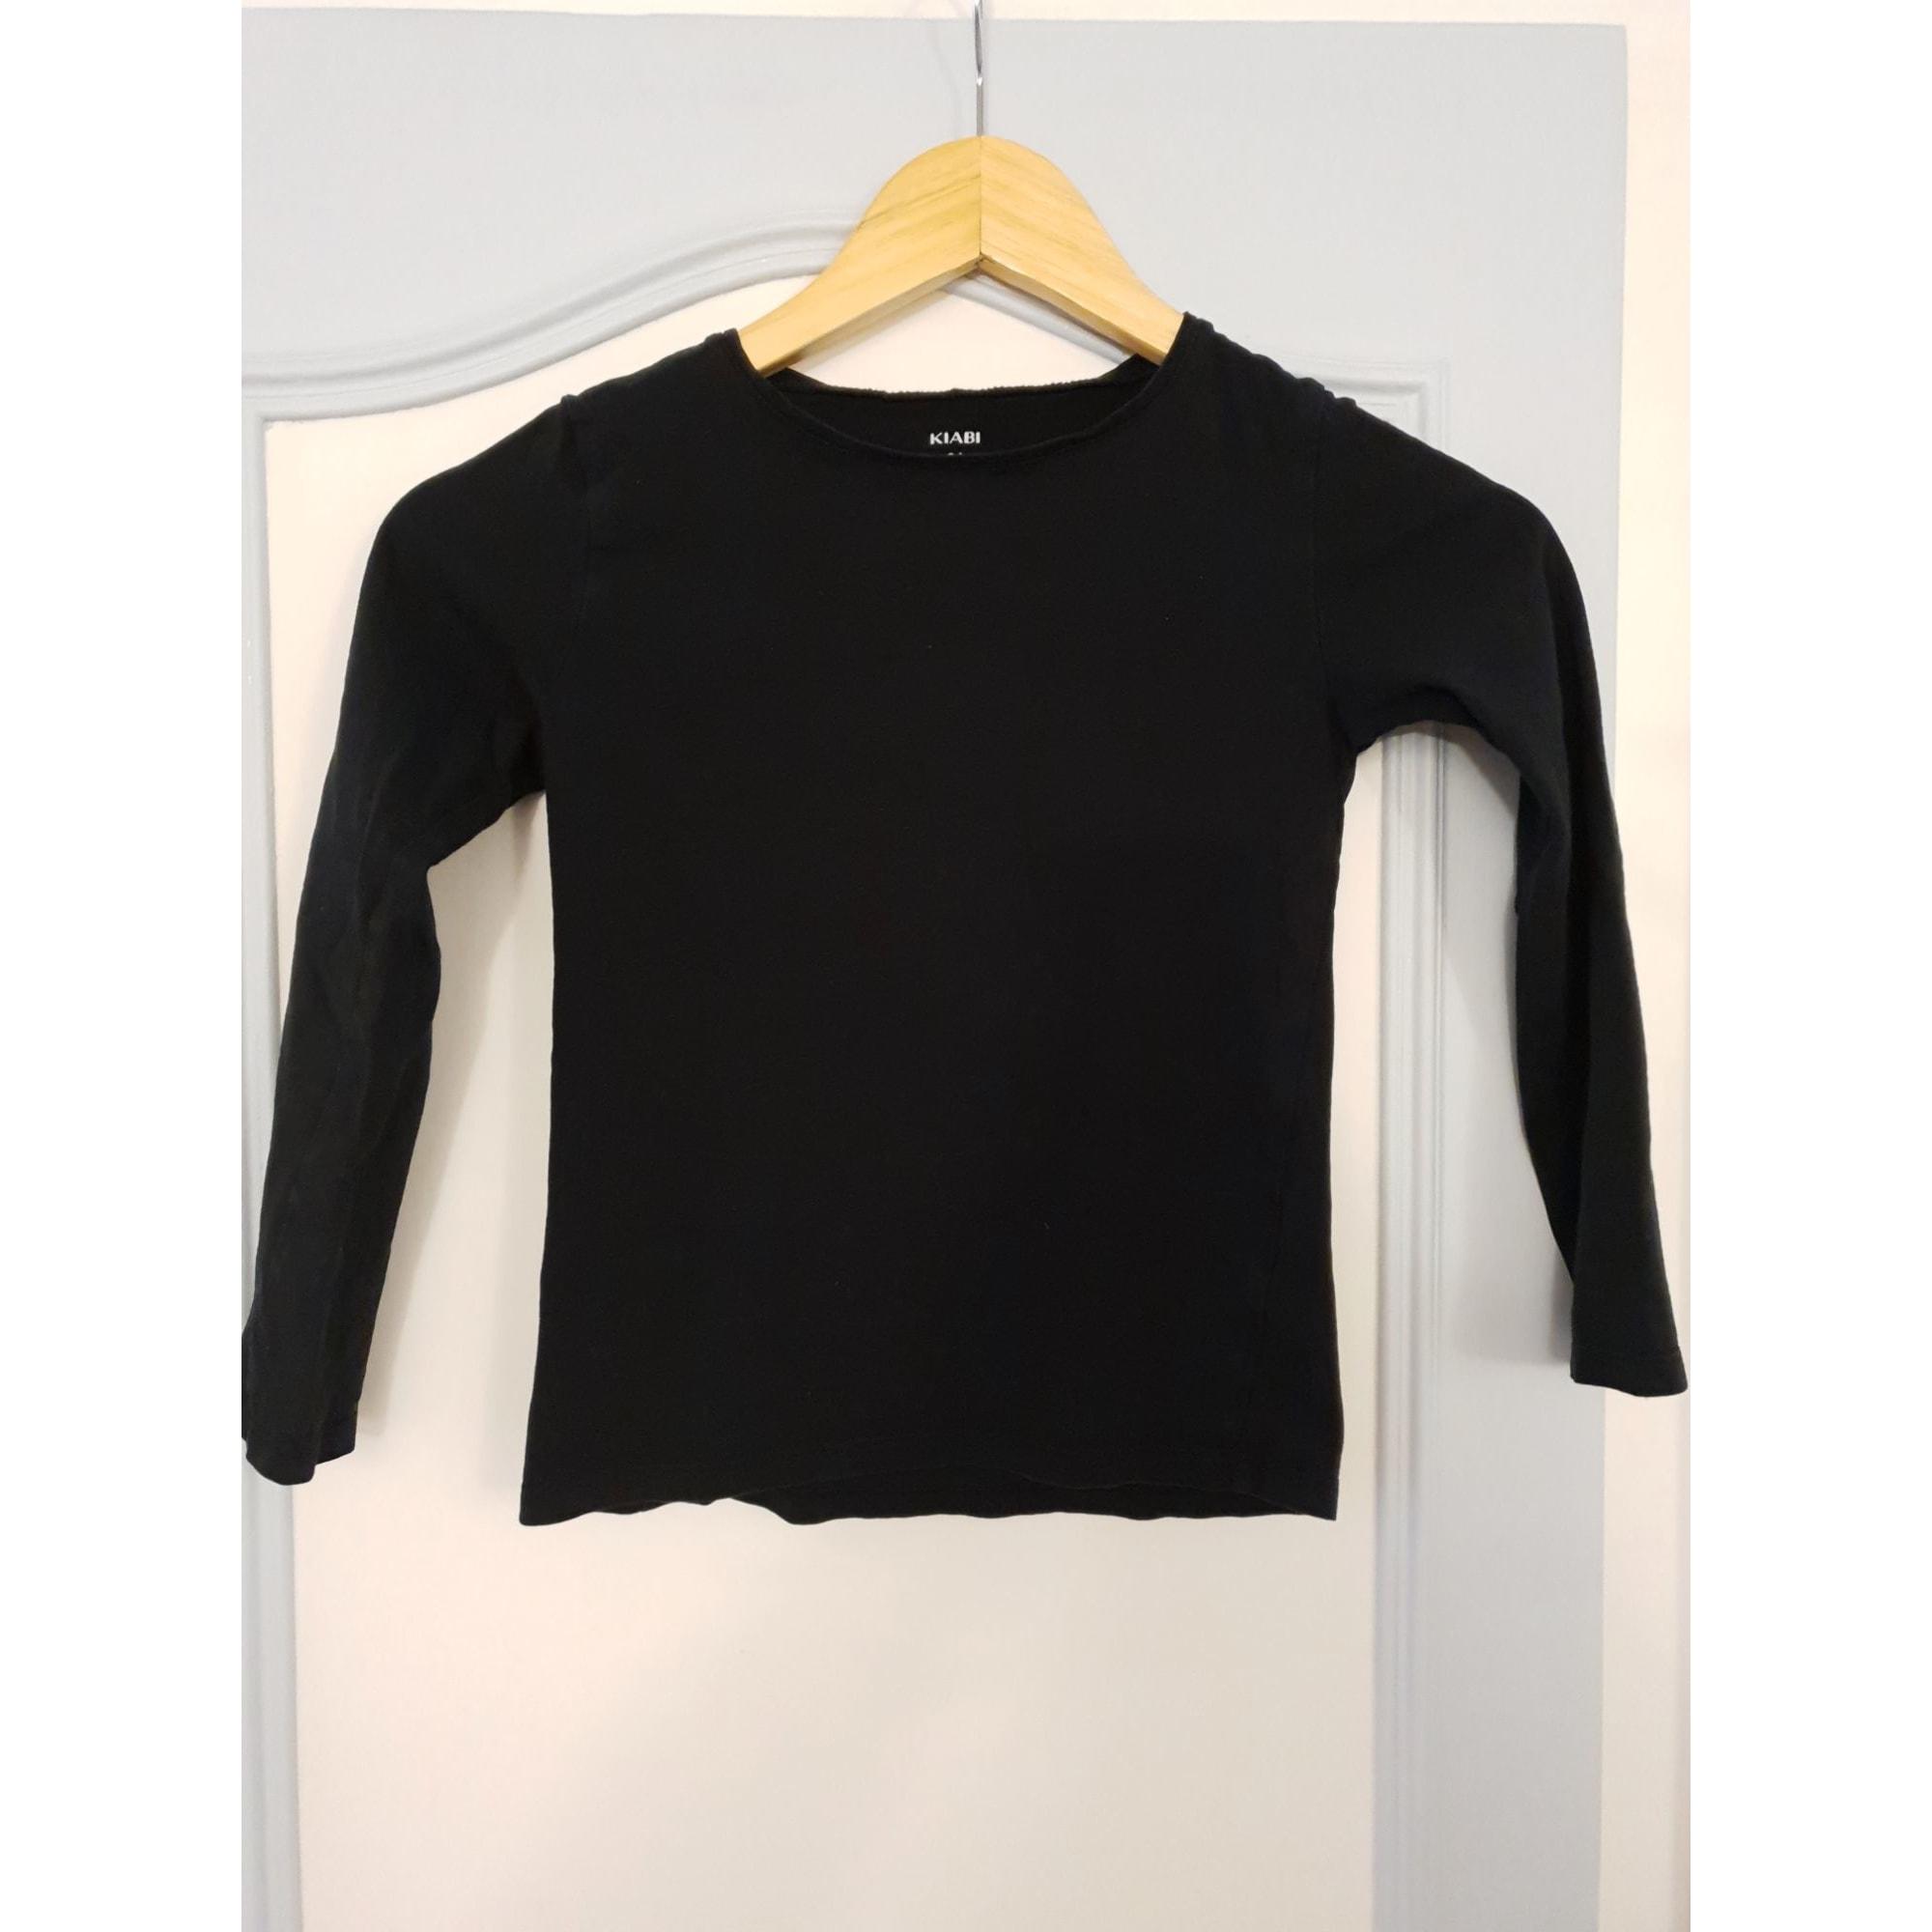 Top, Tee-shirt KIABI Noir